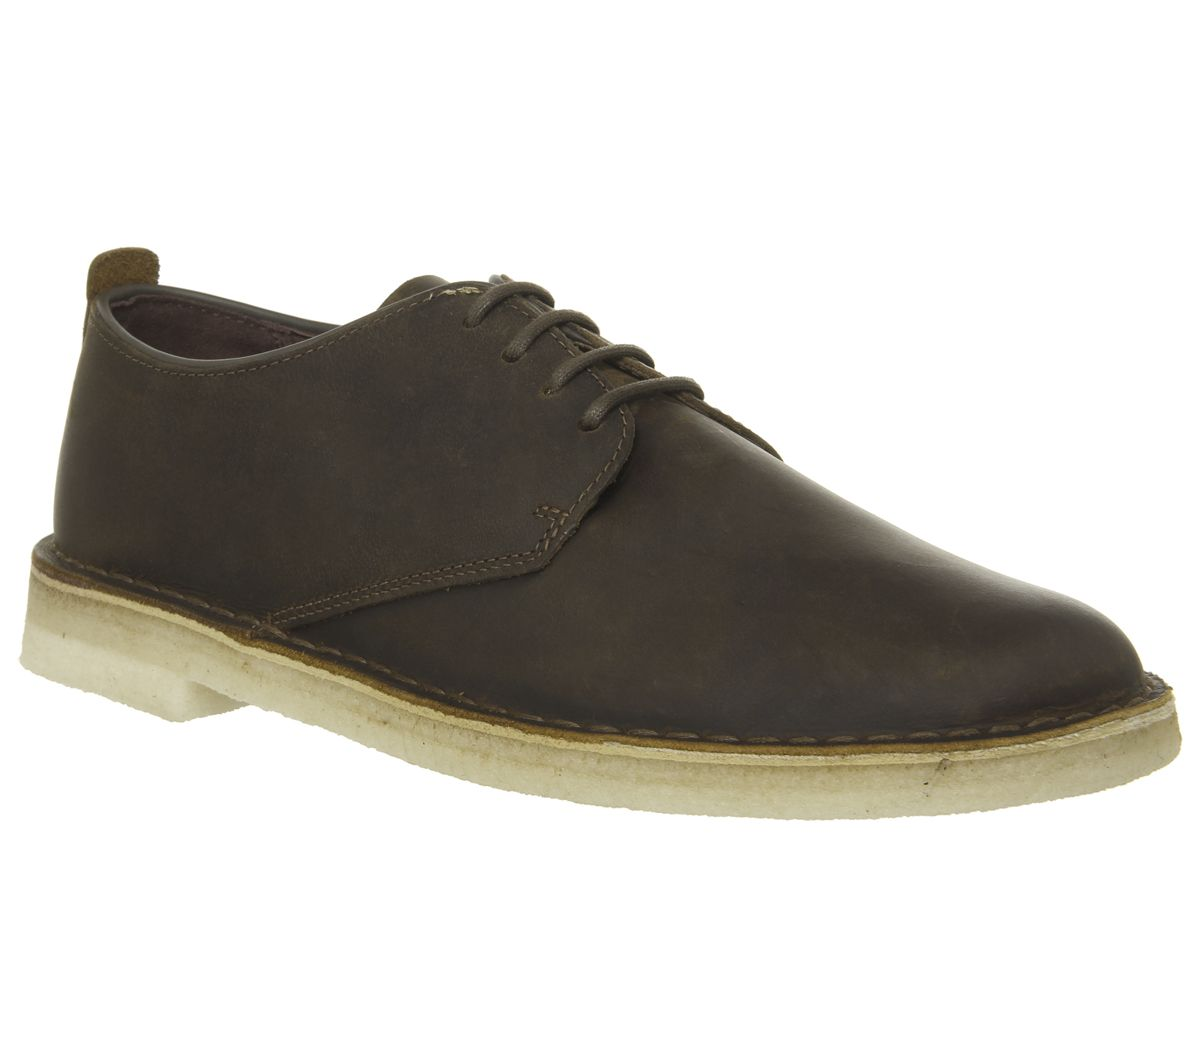 3c6fbf27 Desert London Shoes